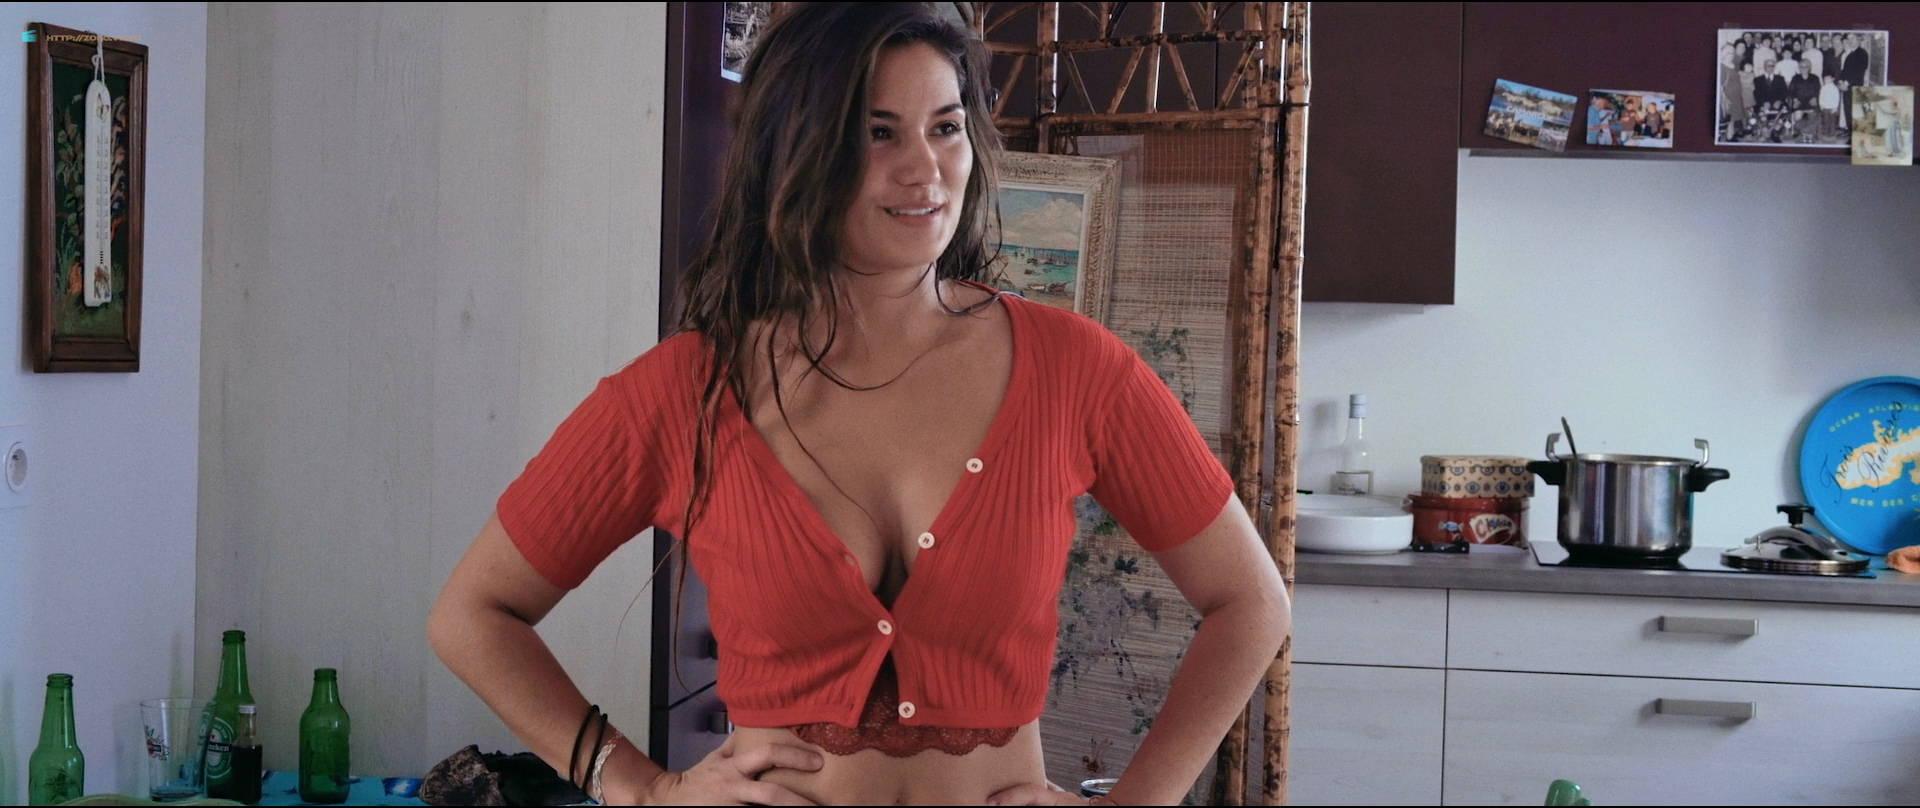 Ophélie Bau nude bush and hot sex - Mektoub, My Love: Canto Uno (FR-2017) HD 1080p BluRay (2)